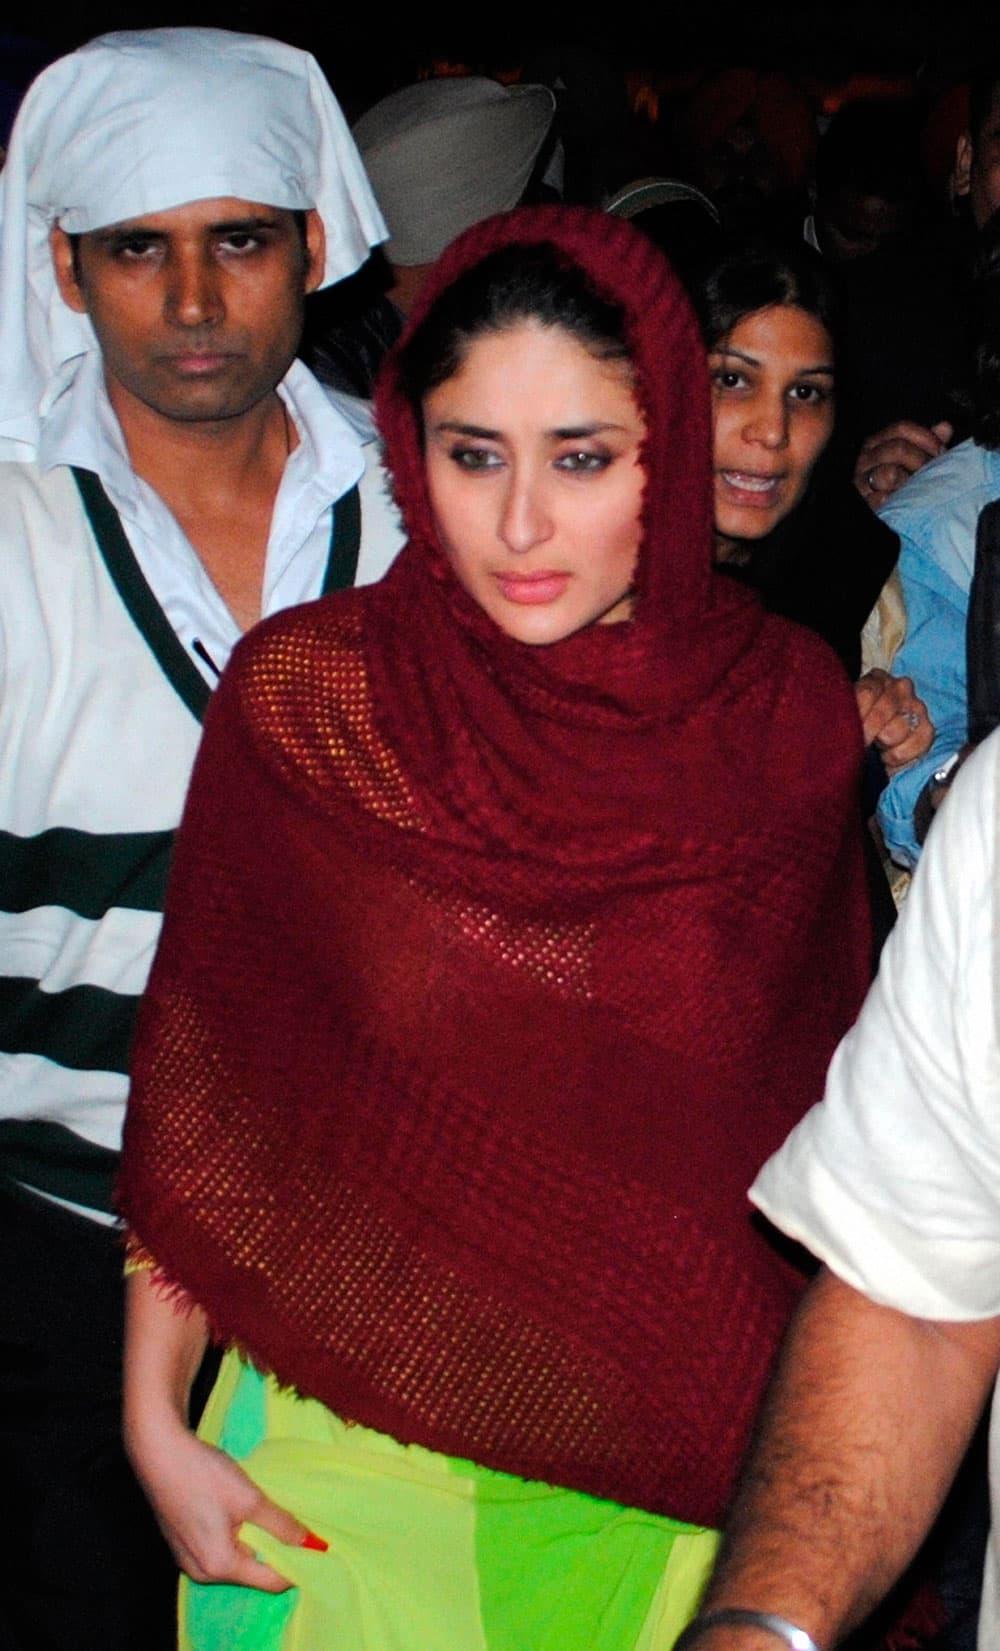 Bollywood actress Kareena Kapoor paying obeisance at Golden Temple in Amritsar.